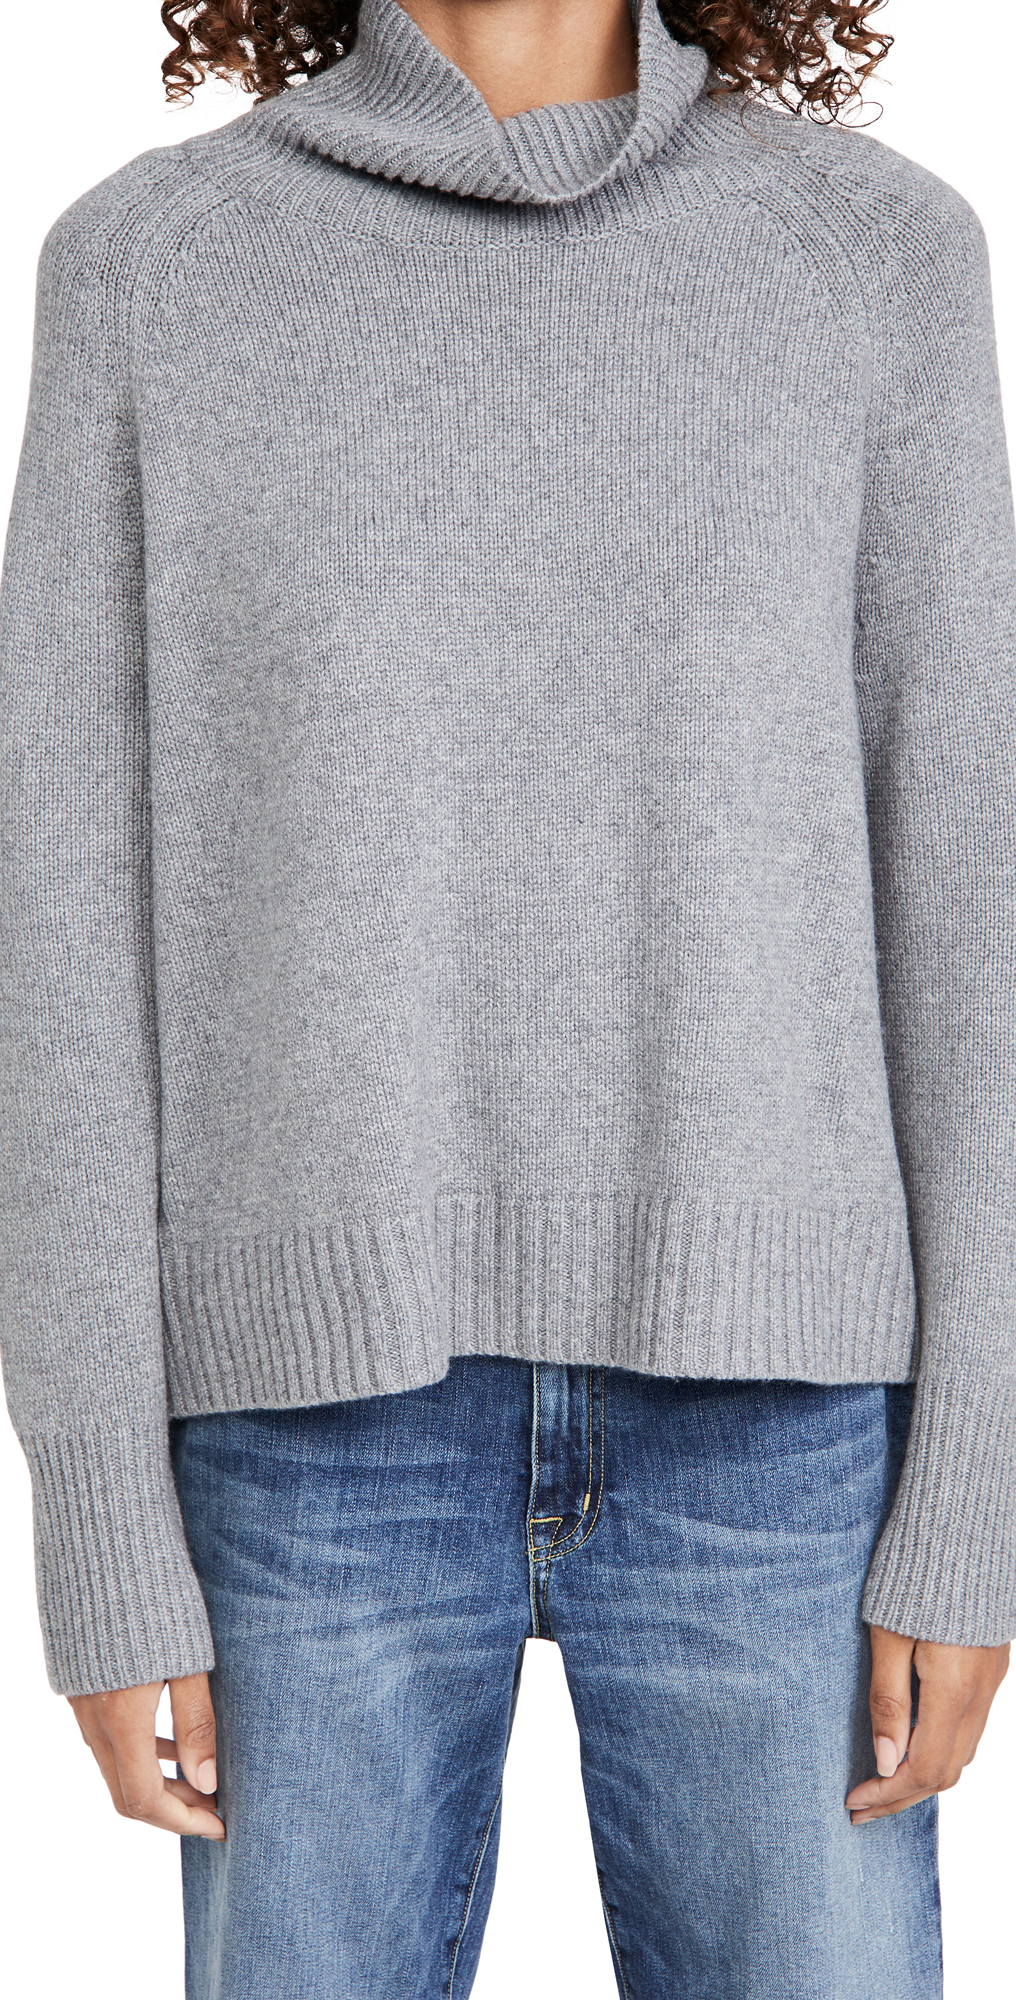 Nili Lotan Lanie Cashmere Sweater